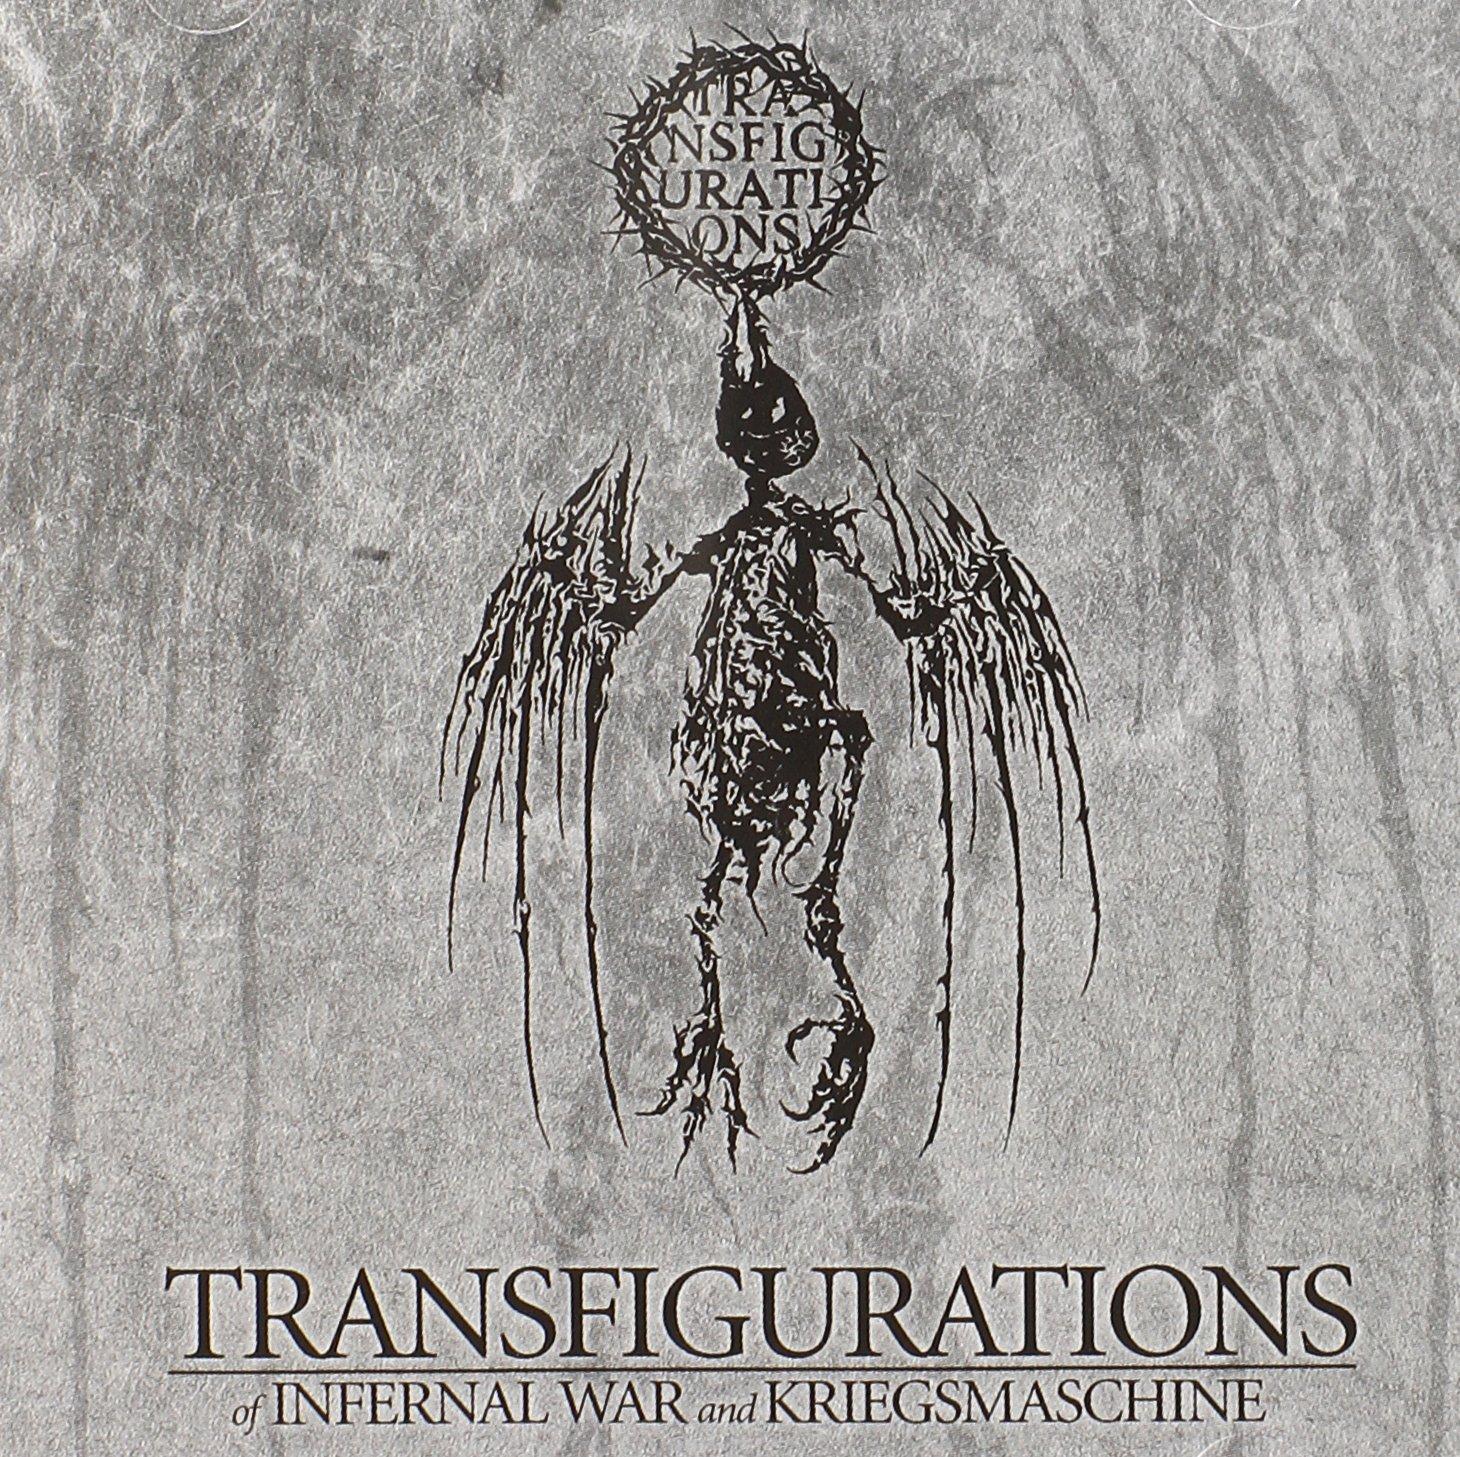 CD : Infernal War - Transfigurations (CD)